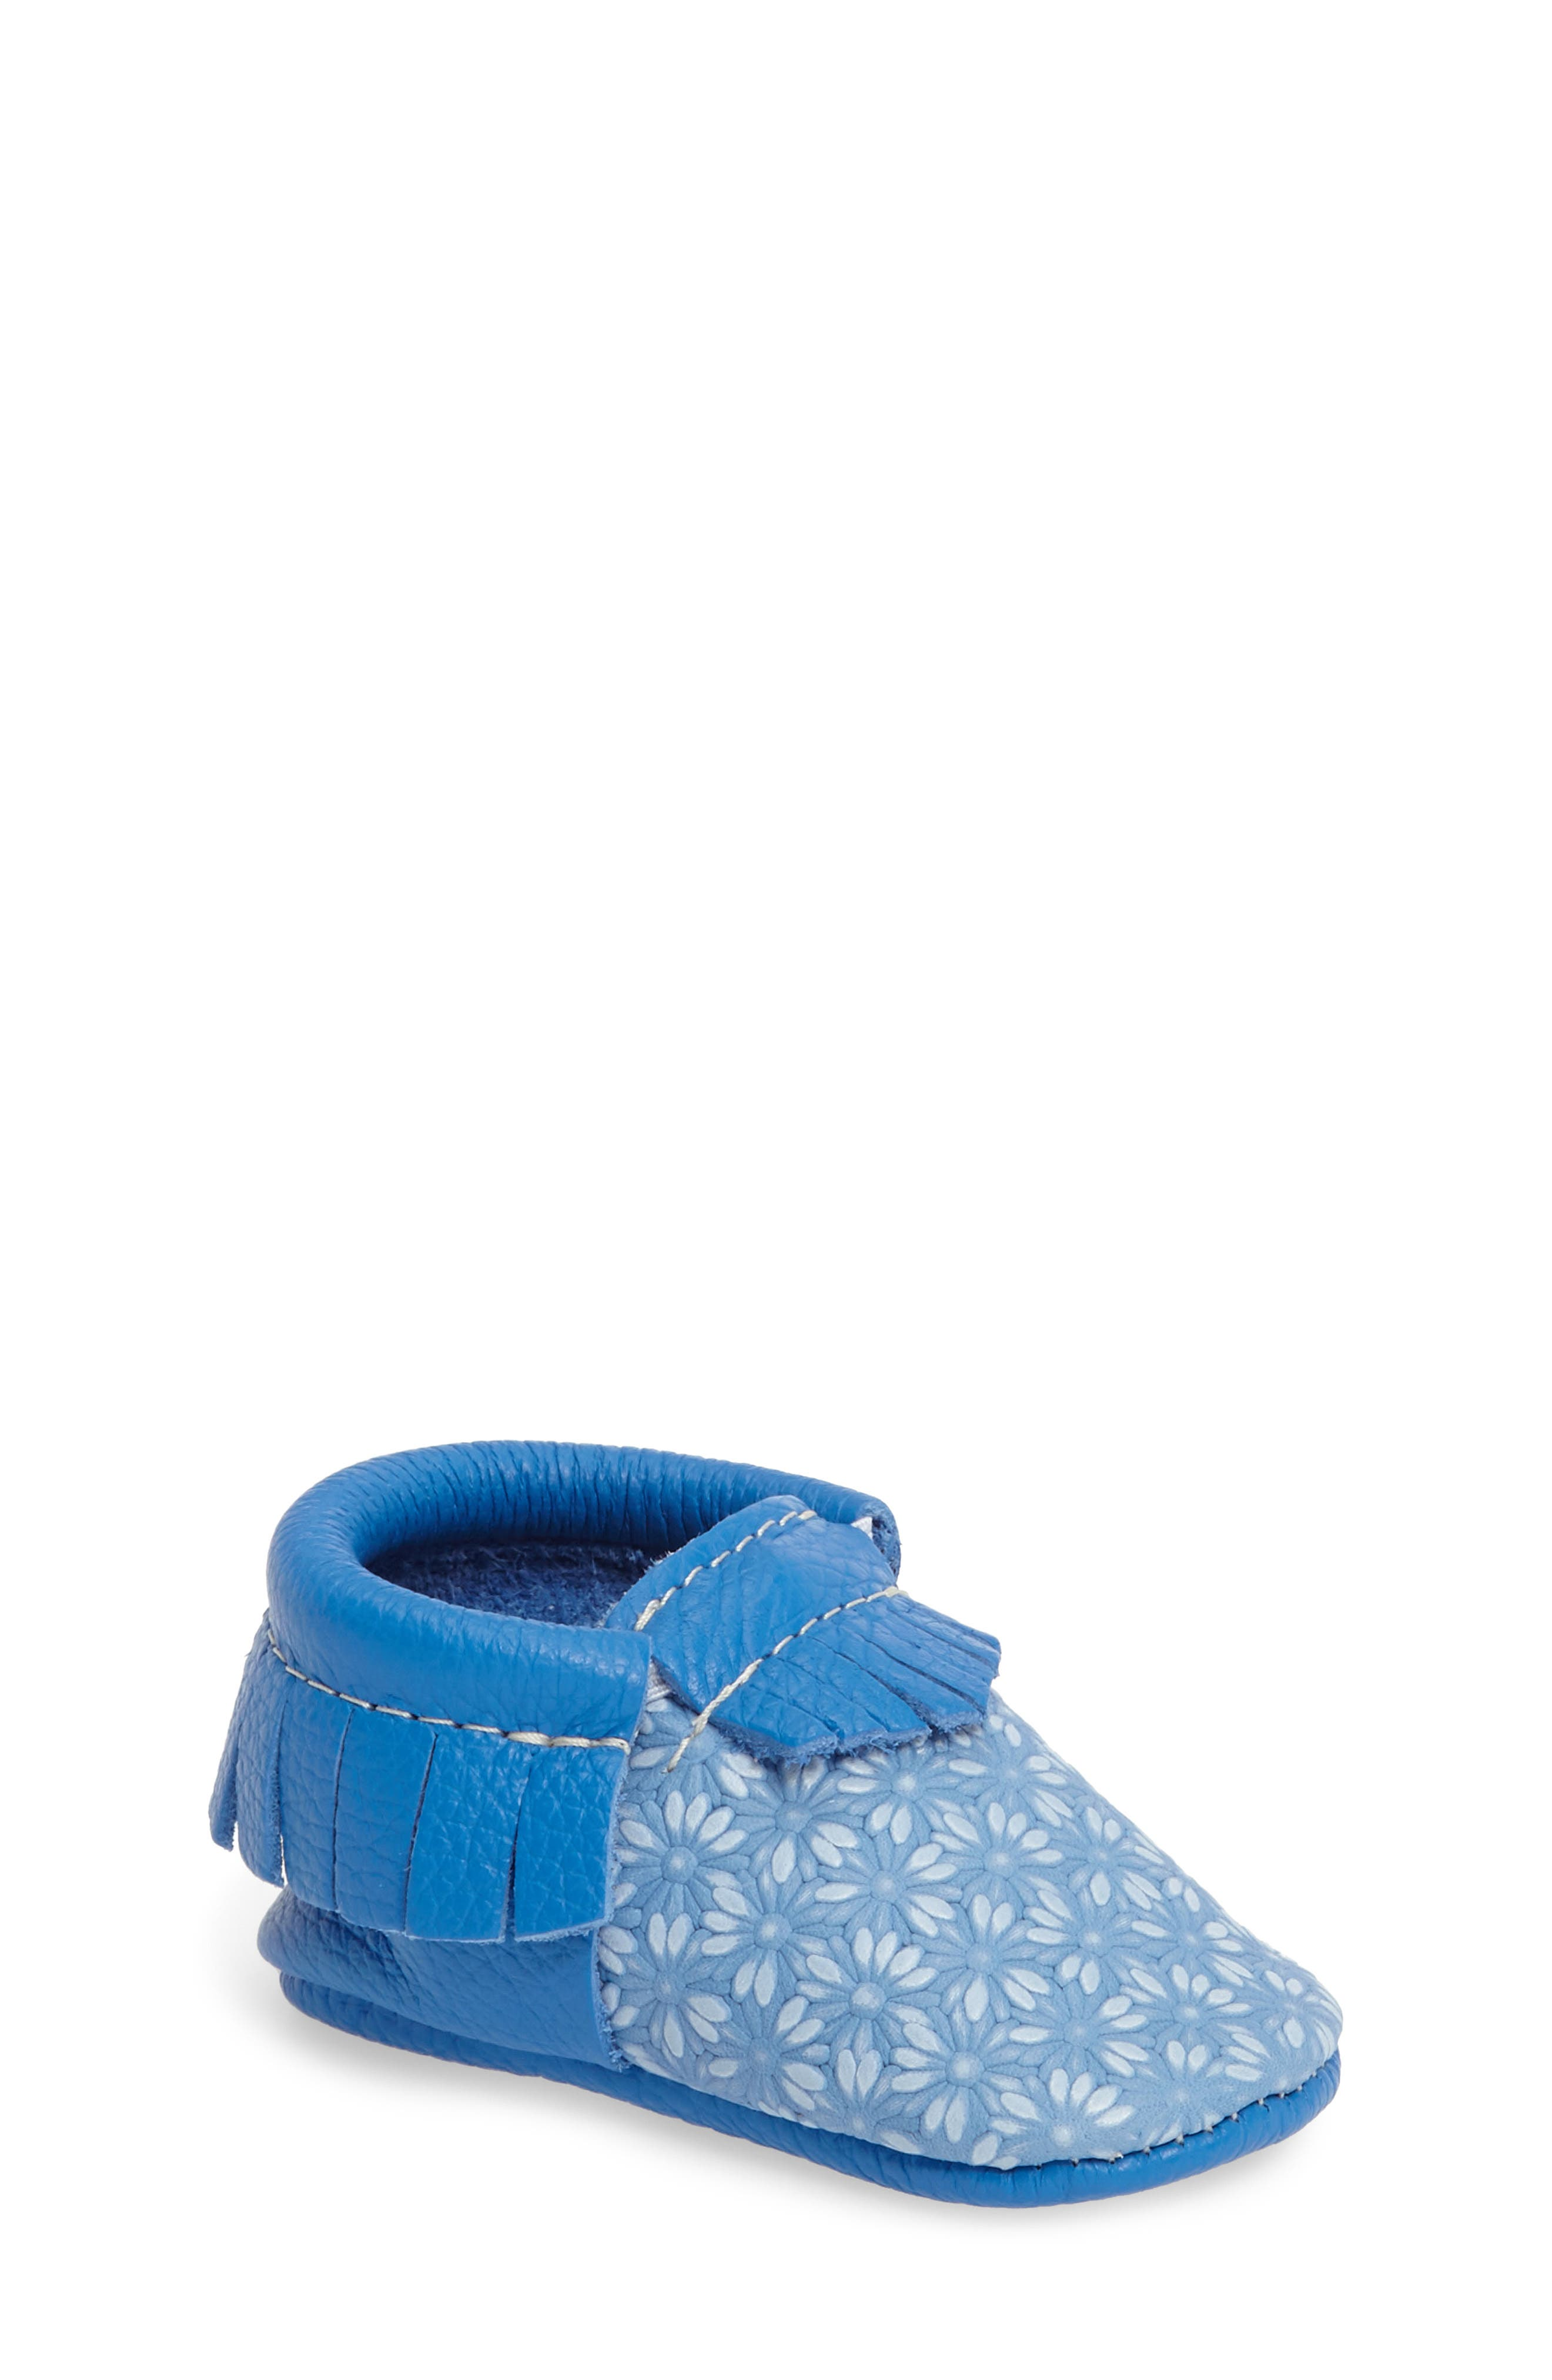 Freshly Picked Daisy Moccasin Crib Shoe (Baby & Walker)